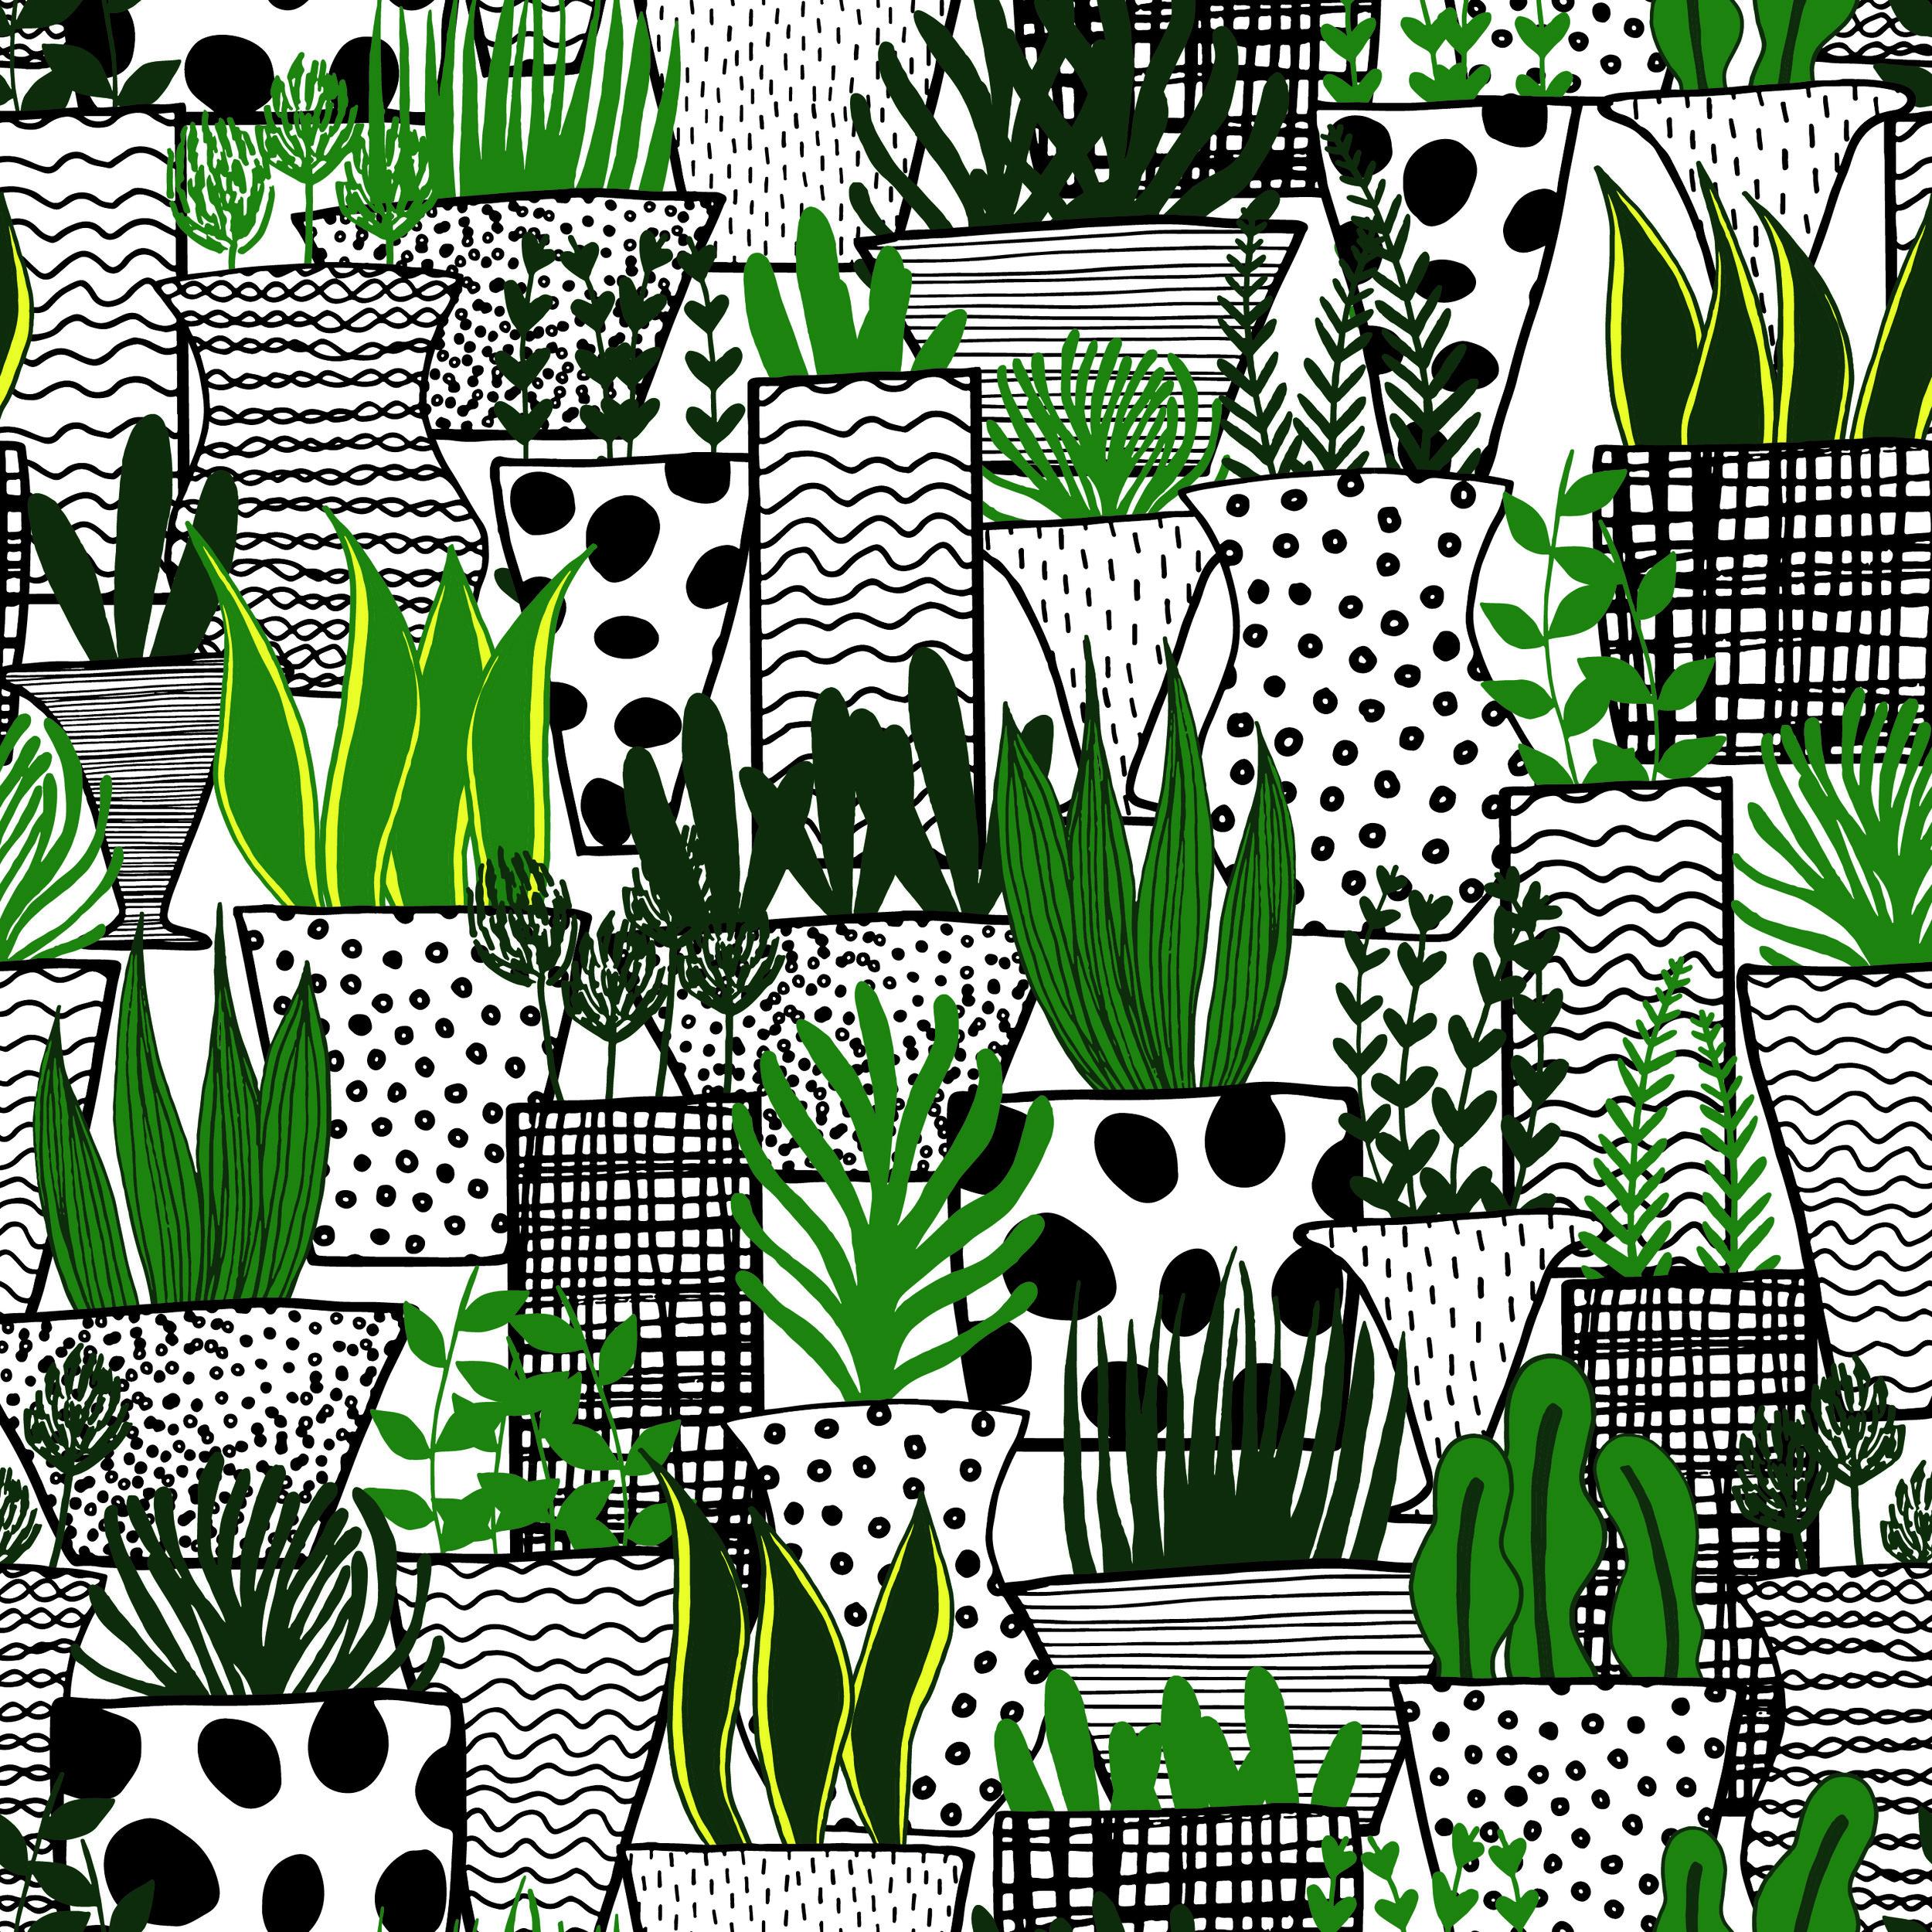 Layered Plants in Pots Pattern.jpg